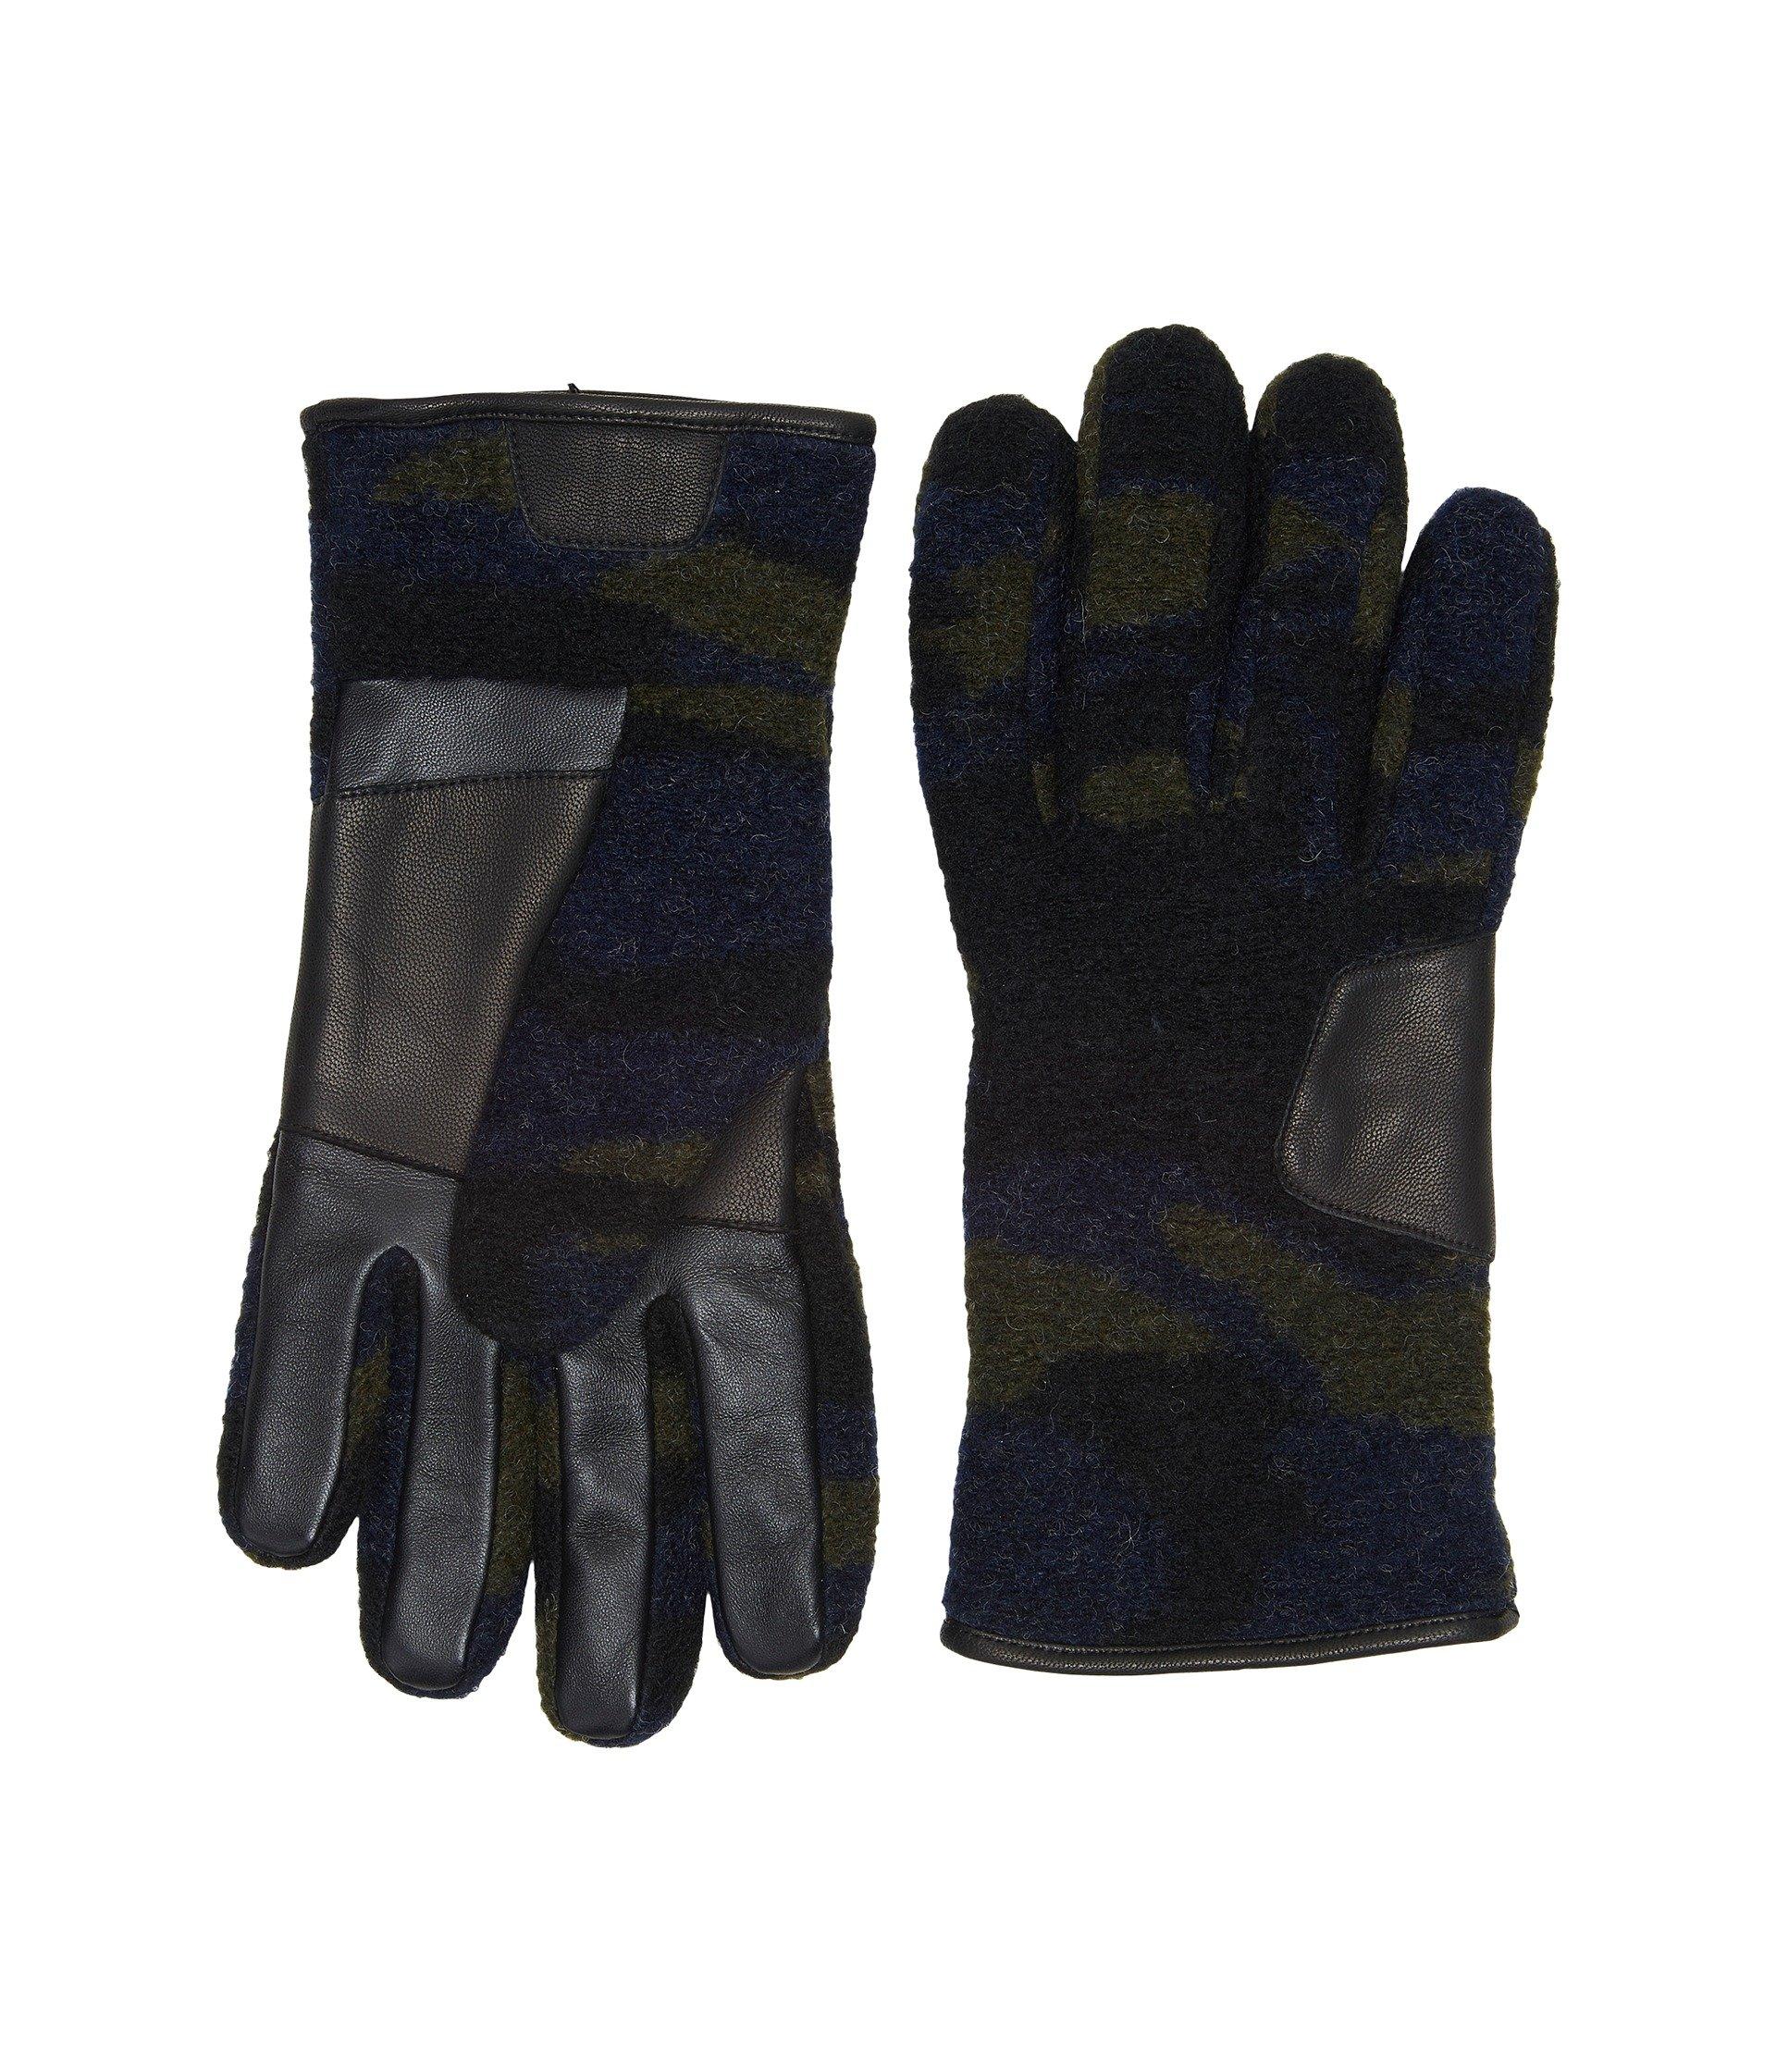 Guantes para Hombre UGG Fabric Smart Gloves w/ Leather Trim  + UGG en VeoyCompro.net